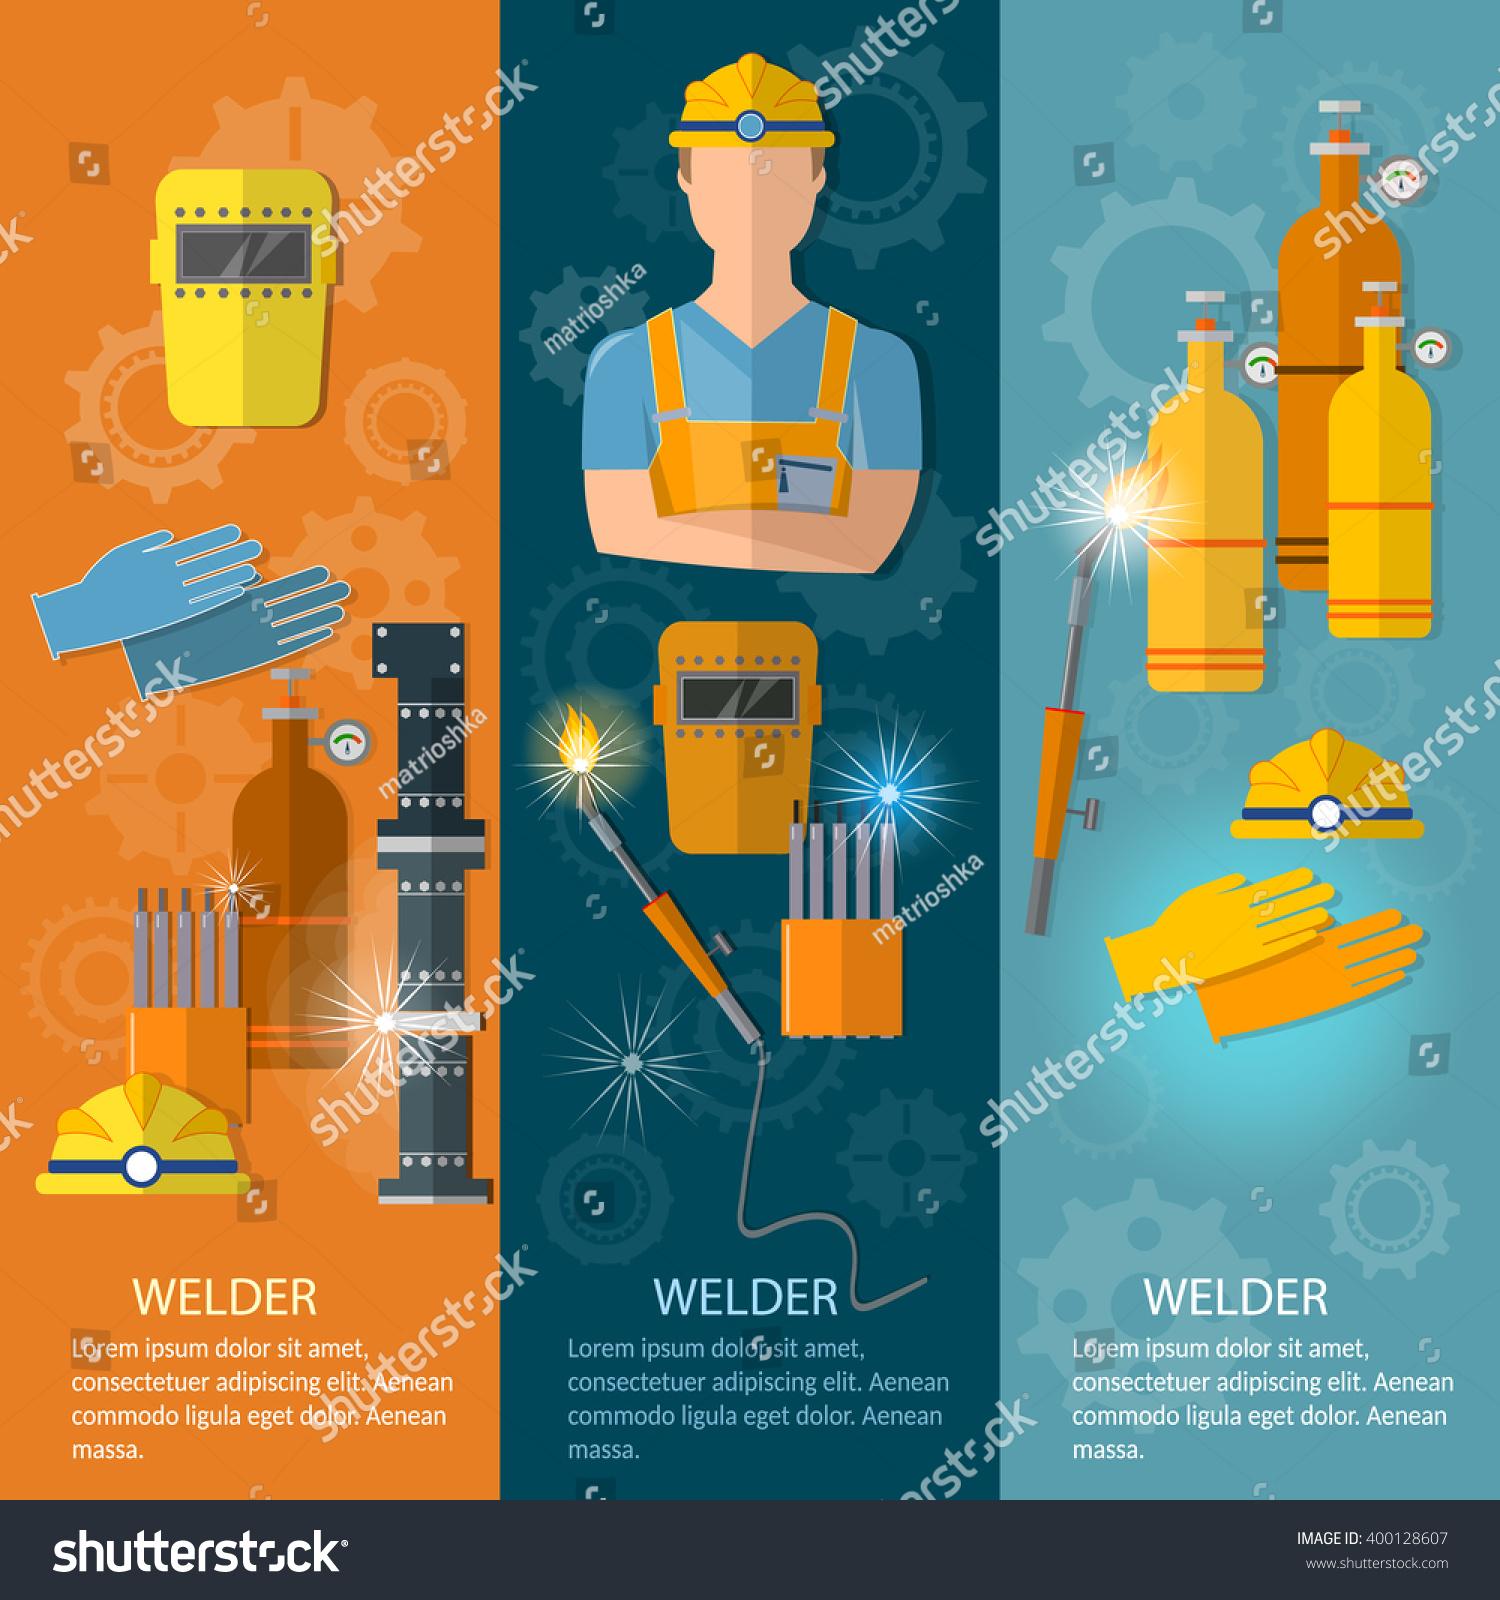 Professional Welder Banner Welding Tools Equipment Stock Vector Diagram Of And Illustration